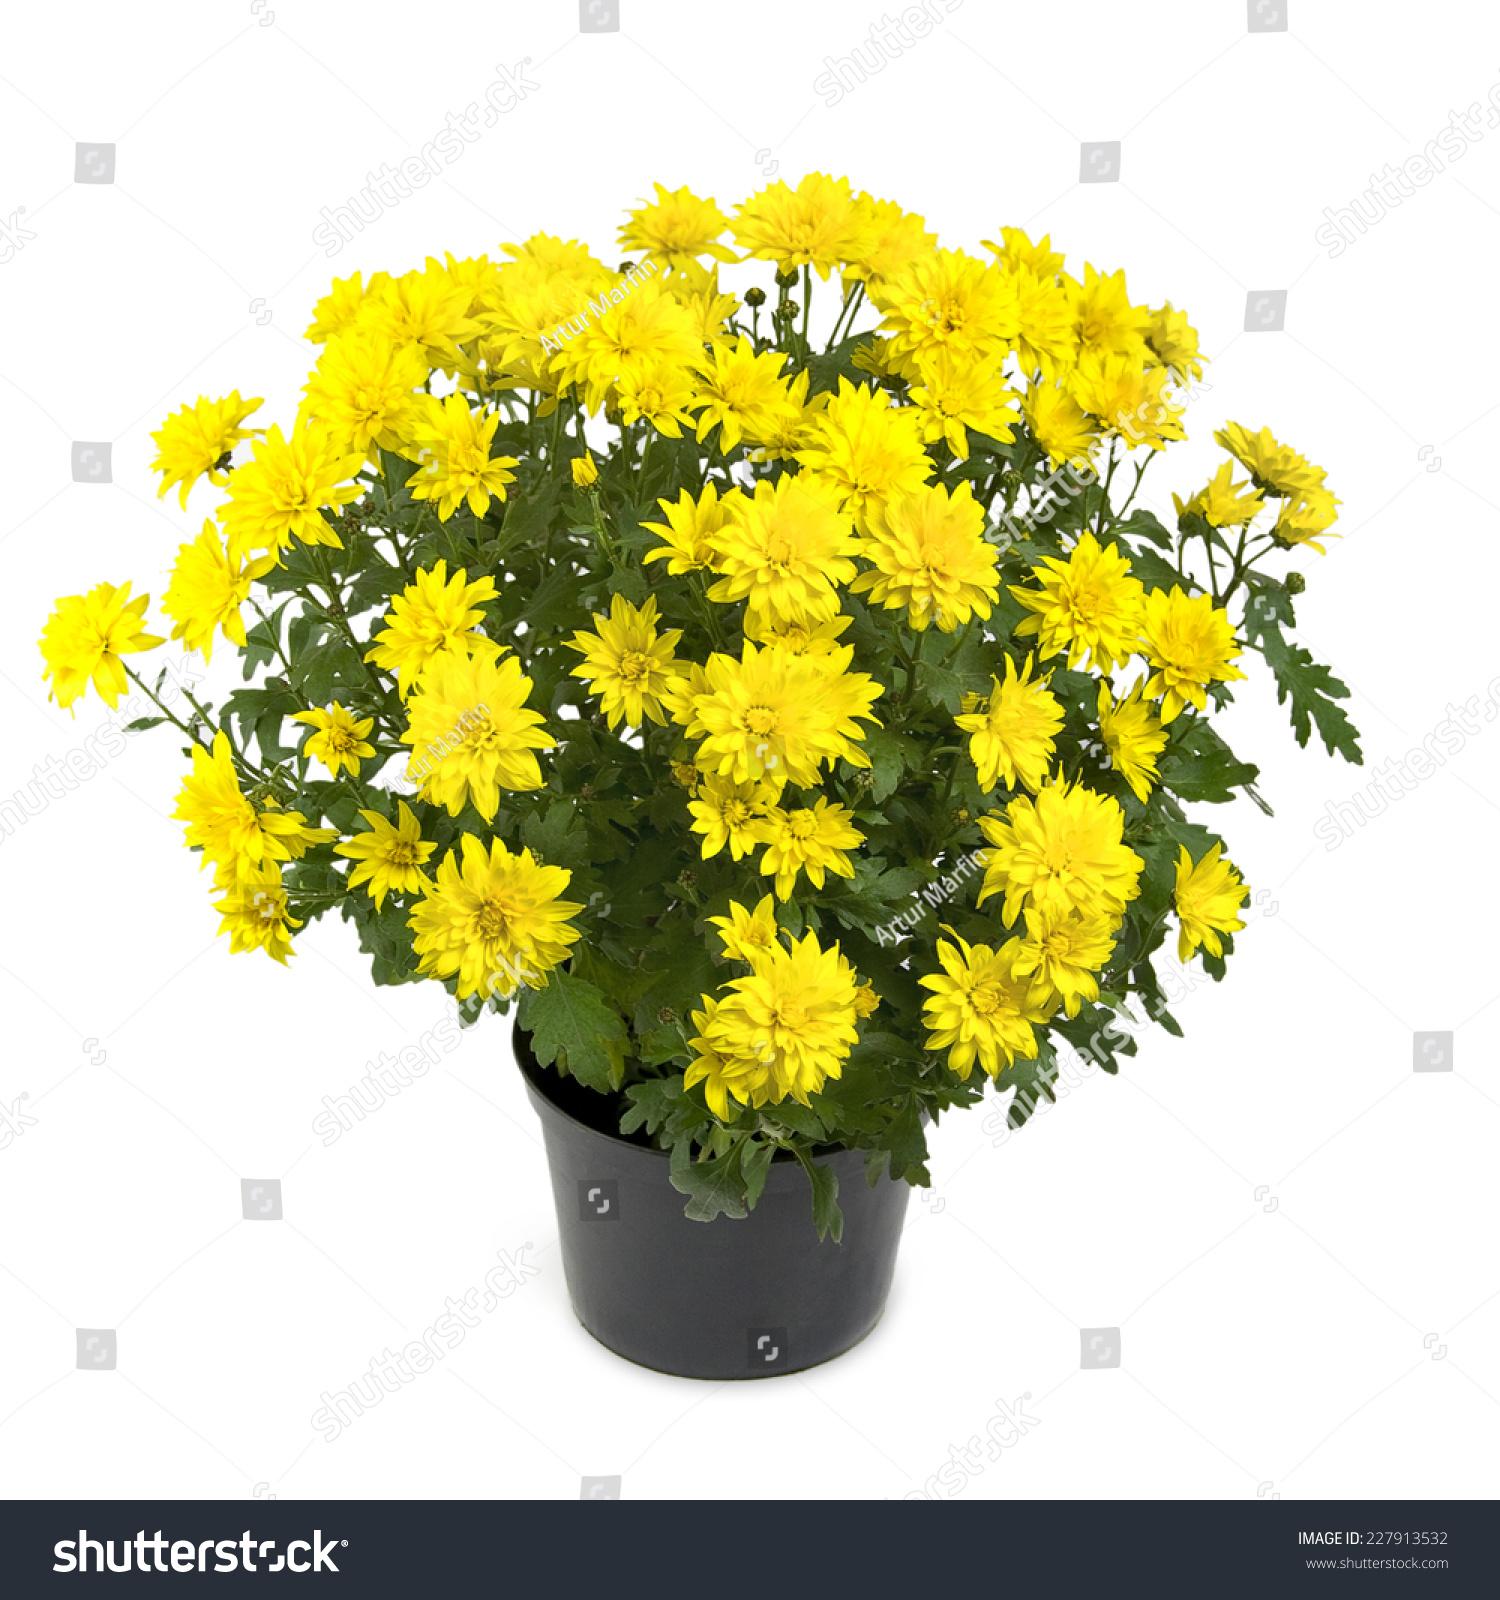 Yellow Chrysanthemum Flower Plant Pot Stock Photo Download Now